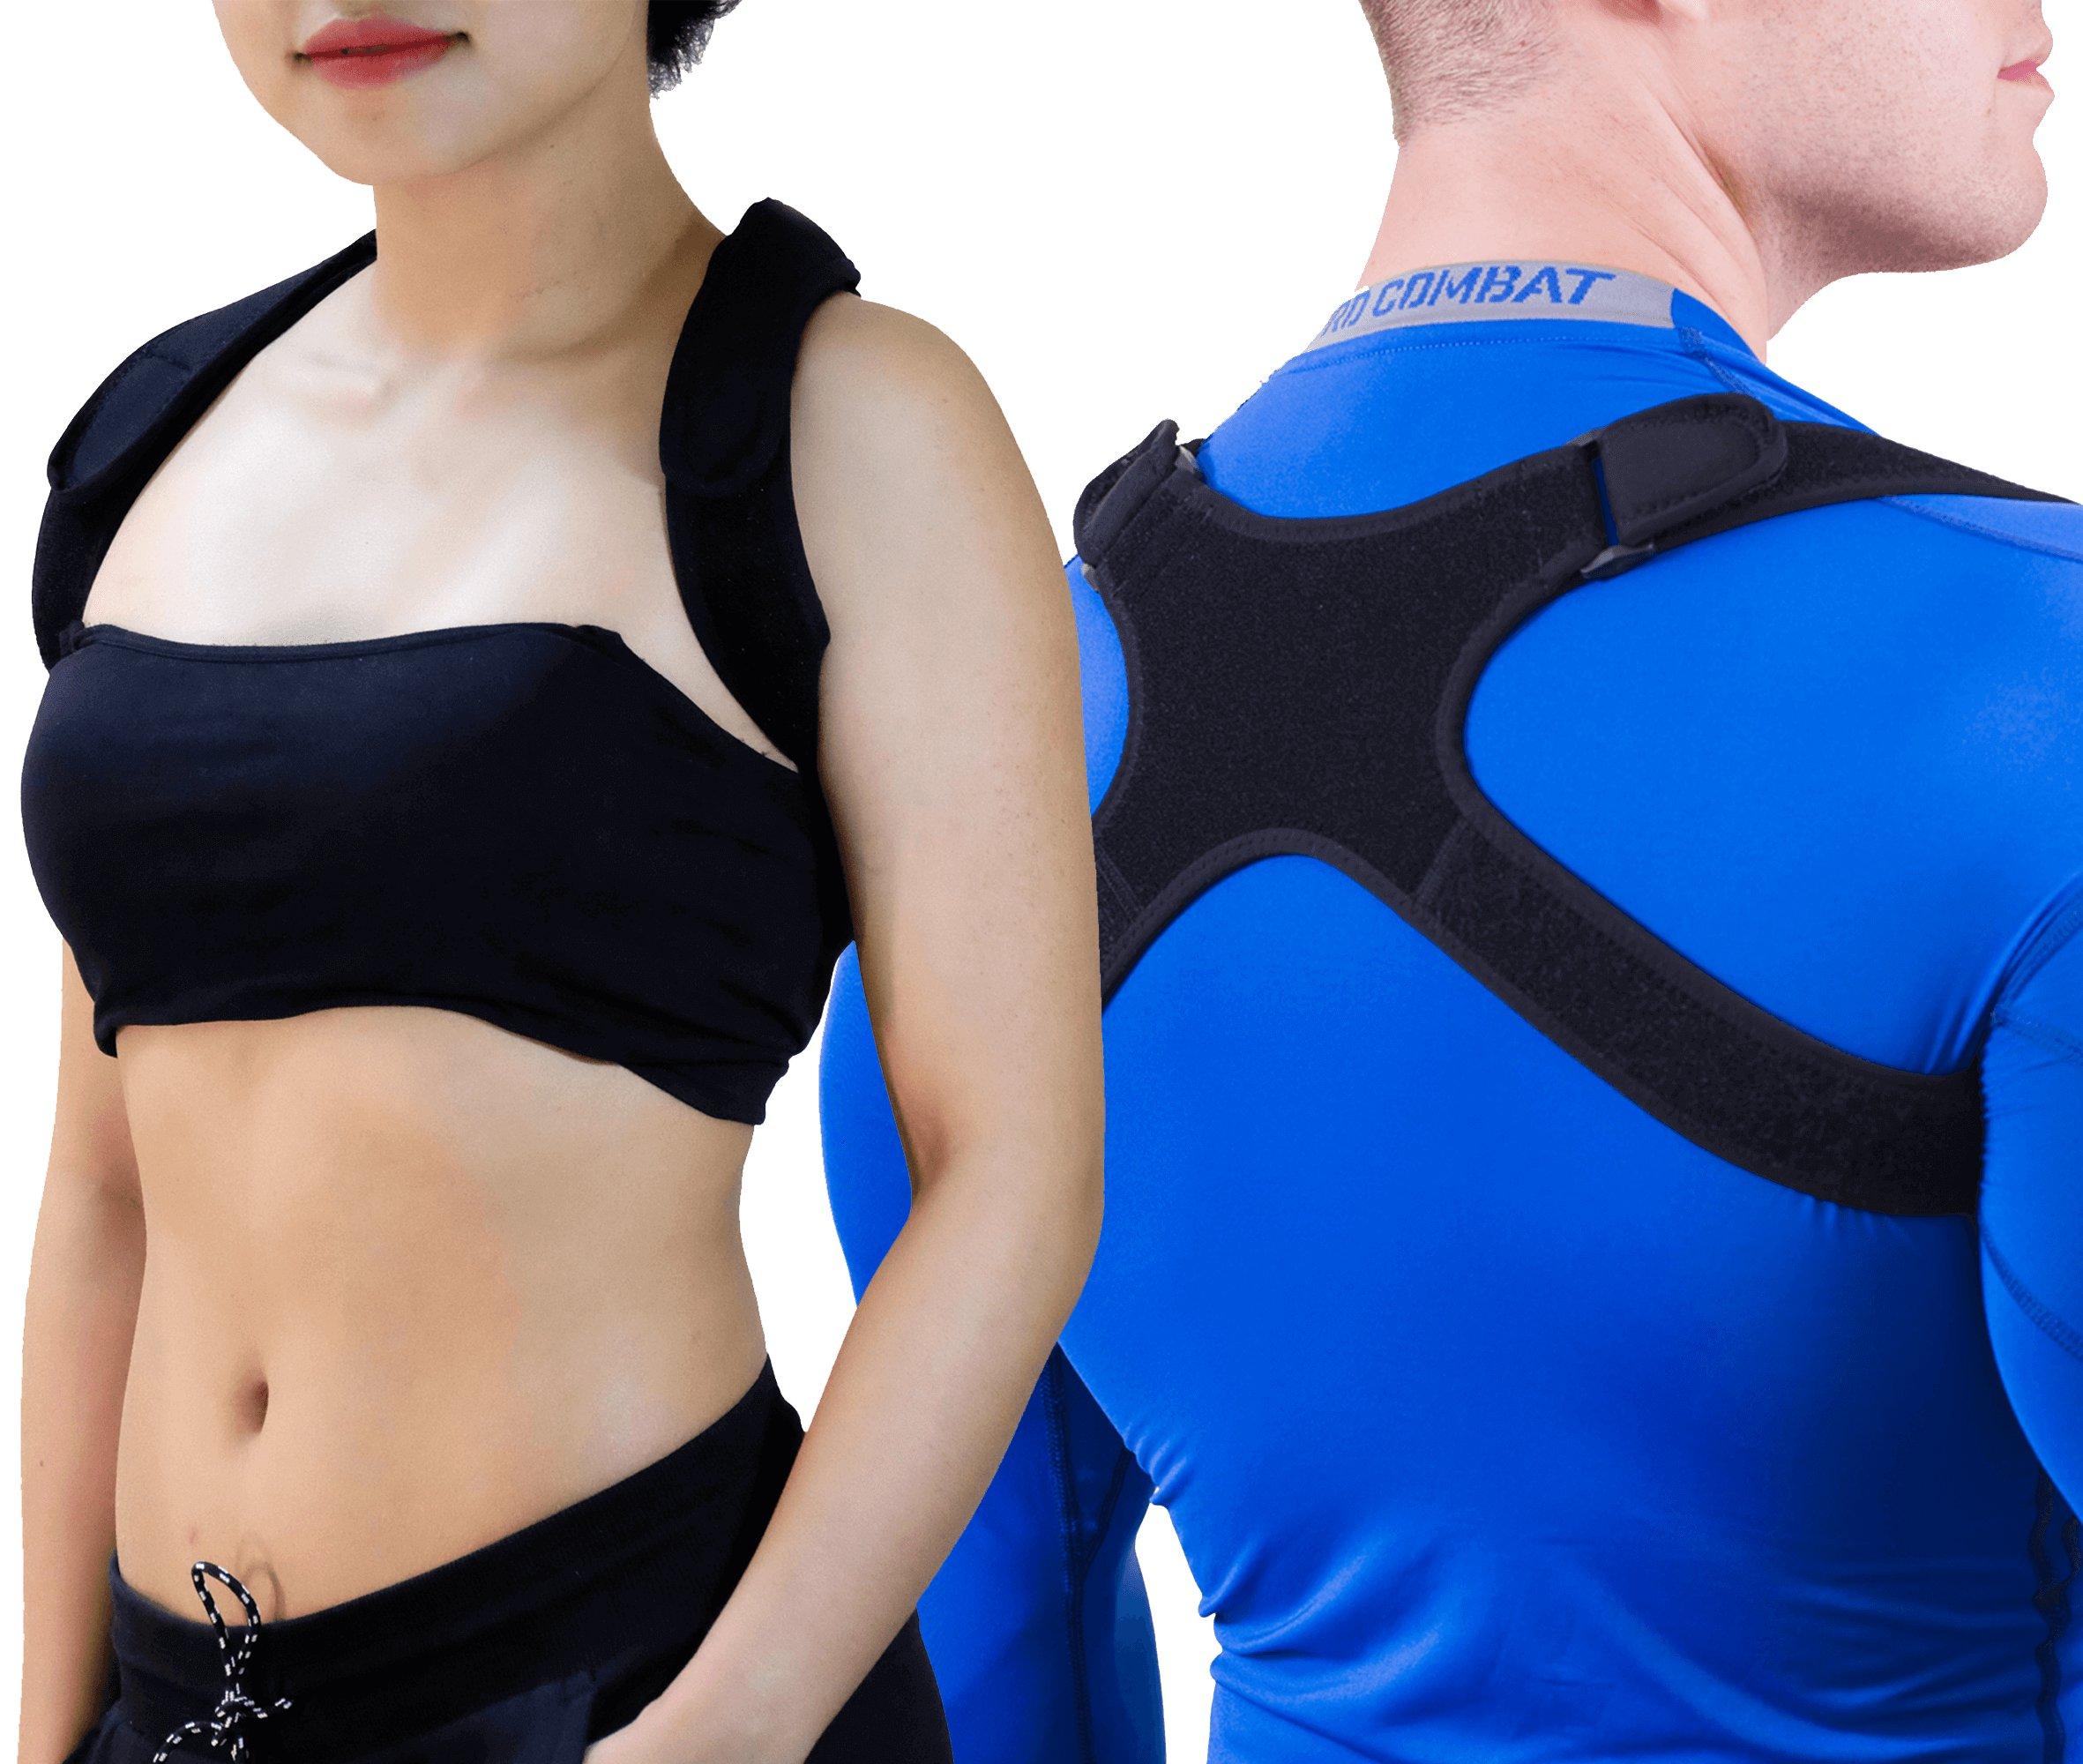 "GAVIMAX Upper Back Support Posture Corrector – Fits 24""-48"" Chest for Women & Men – Elastic Back Brace Corrects Posture at Work – Clavicle Brace Fixes Bad Shoulder Alignment –Velcro Adjustable"